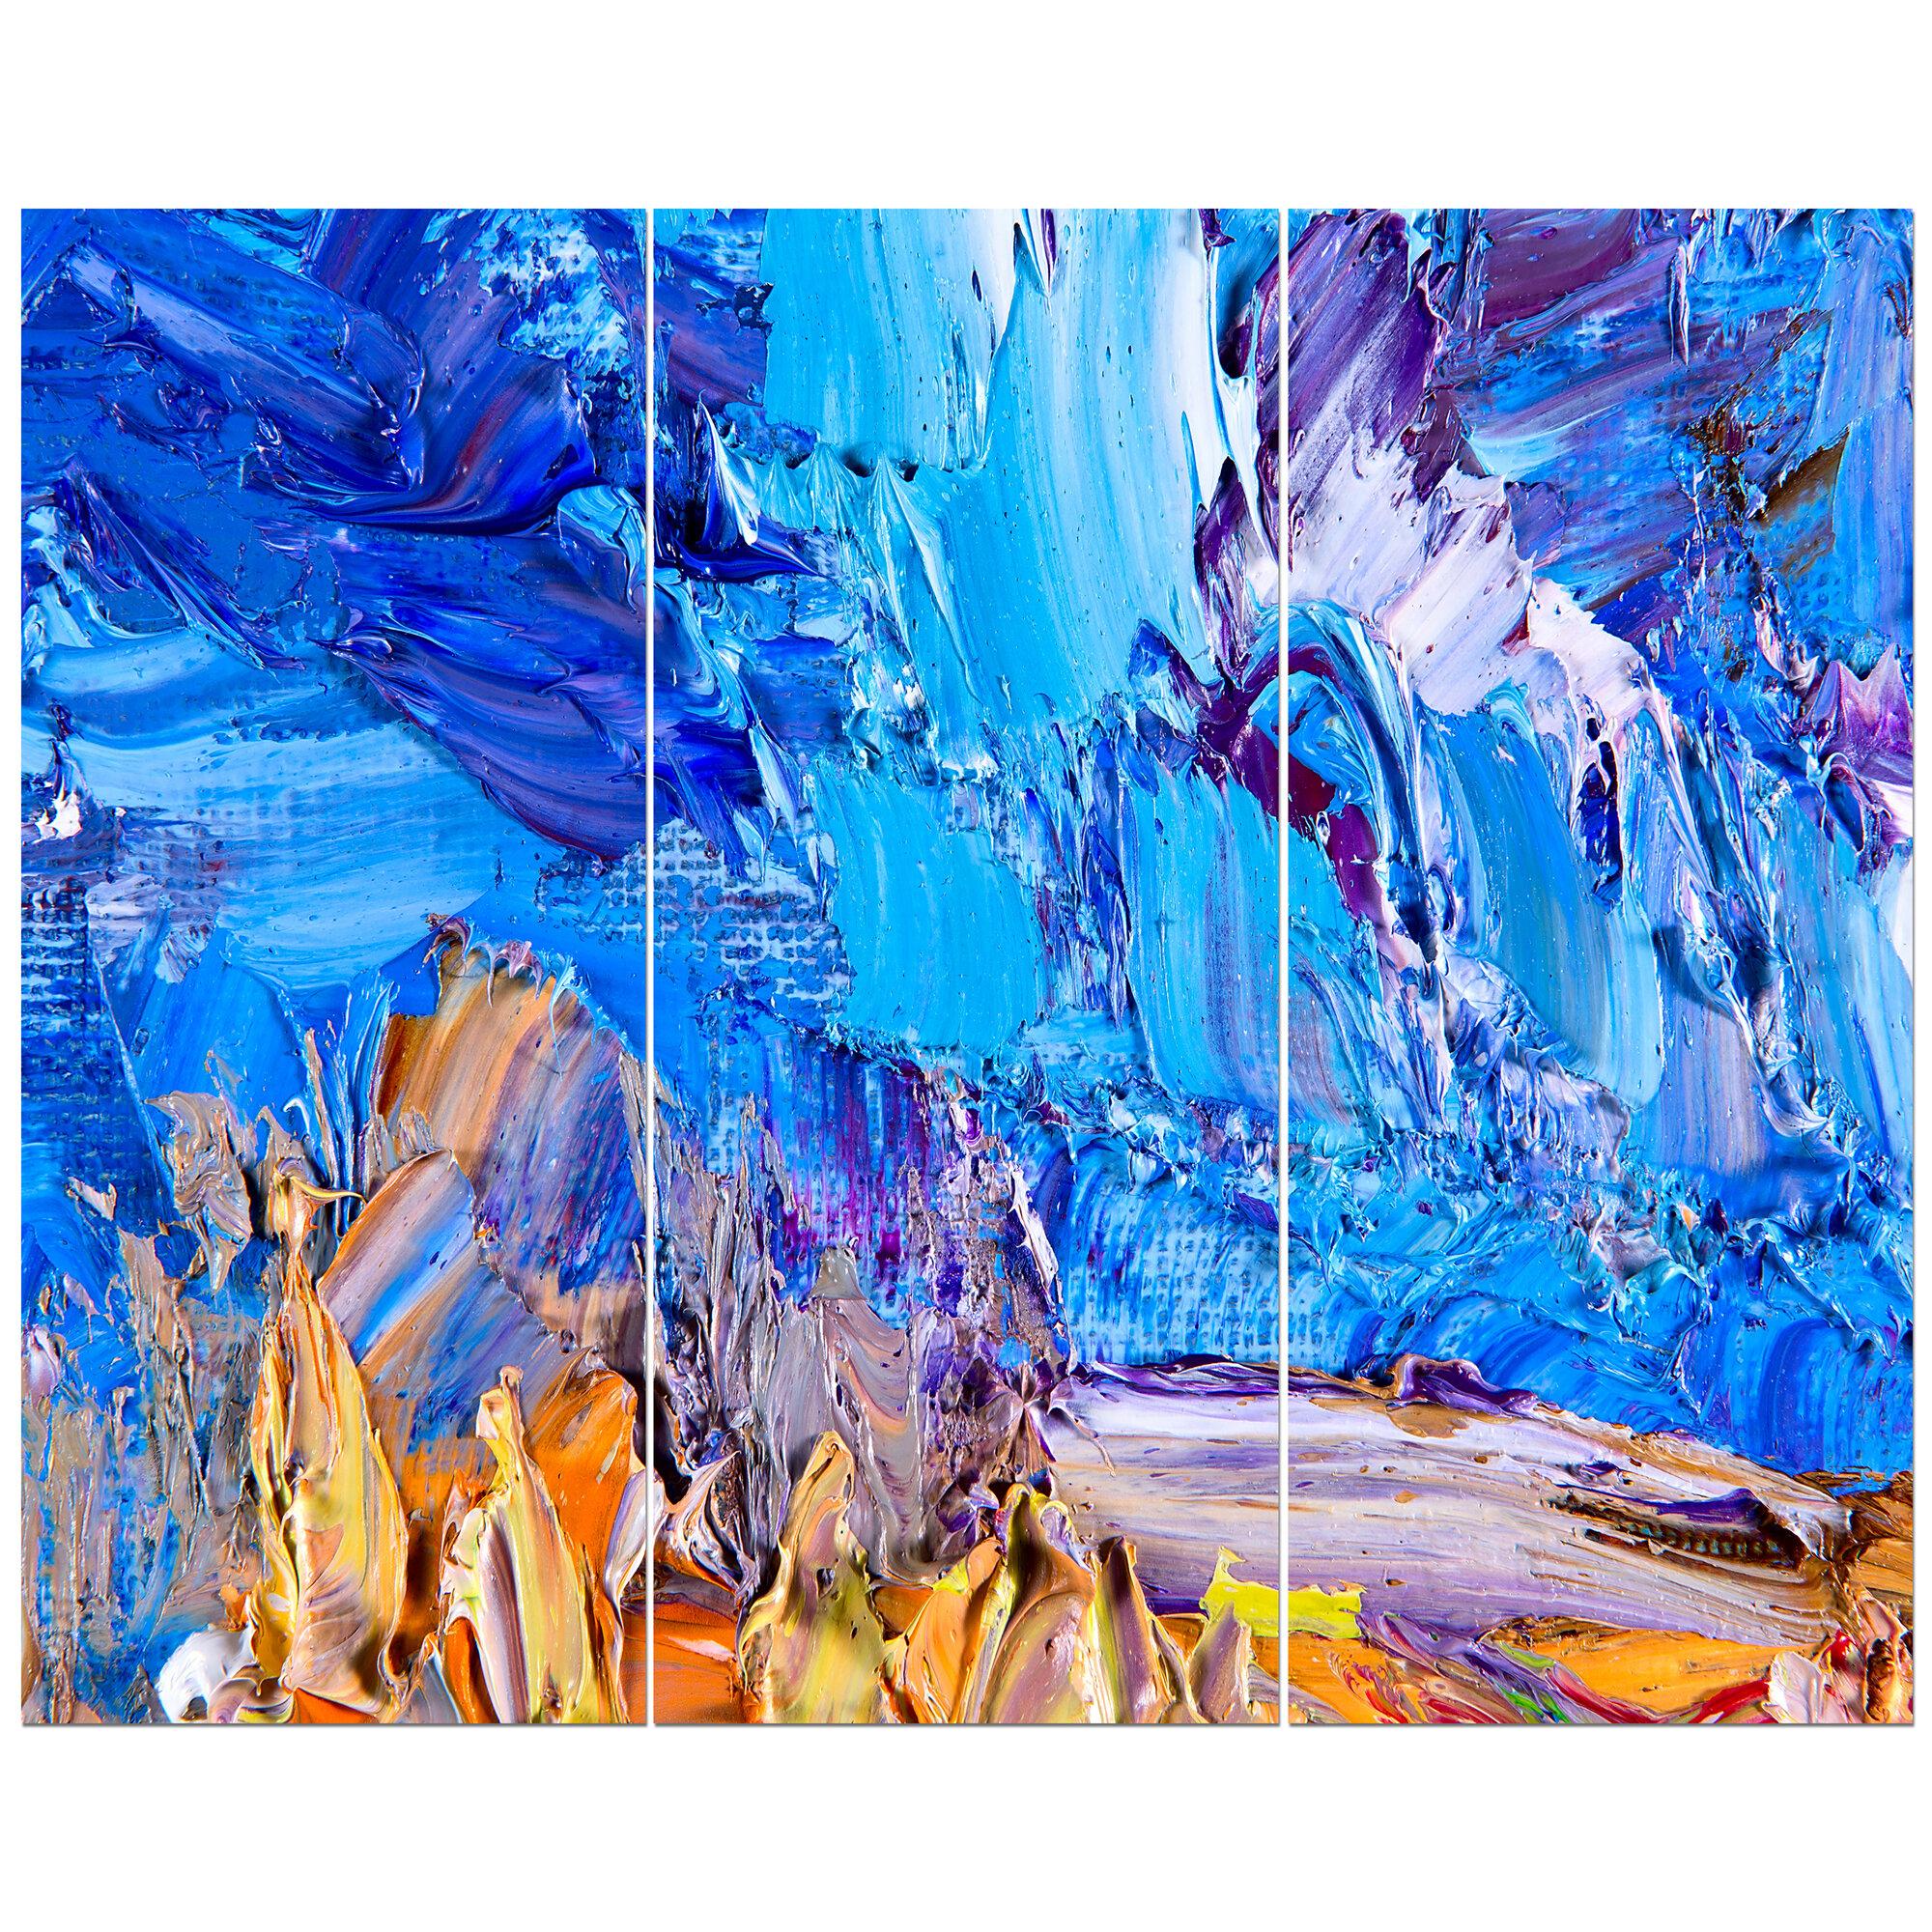 Oil Abstract Art On Canvas